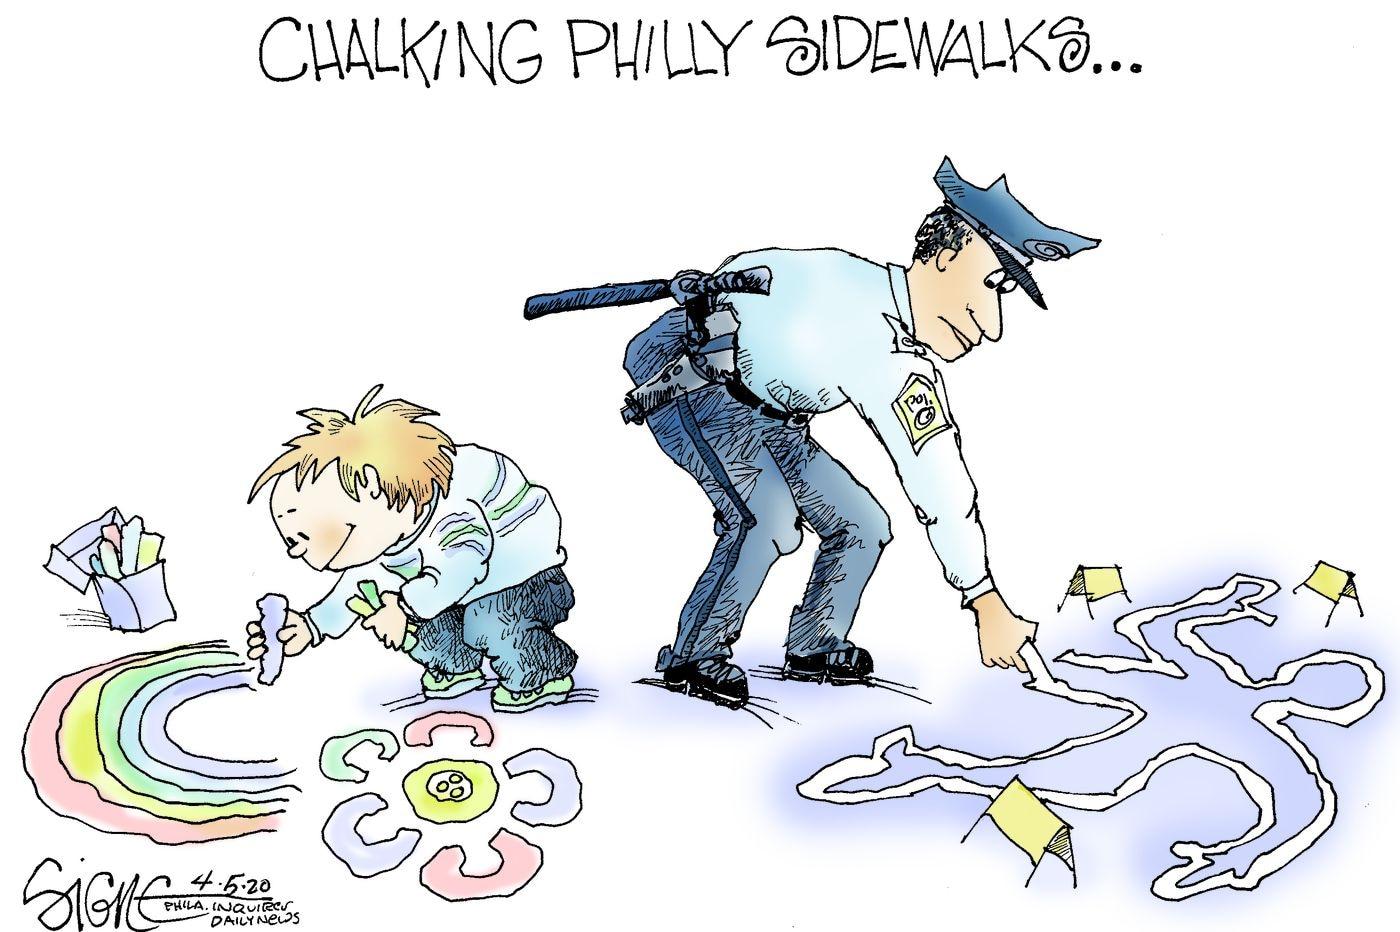 Political Cartoon: Philadelphia's gun virus viewed from the sidewalk